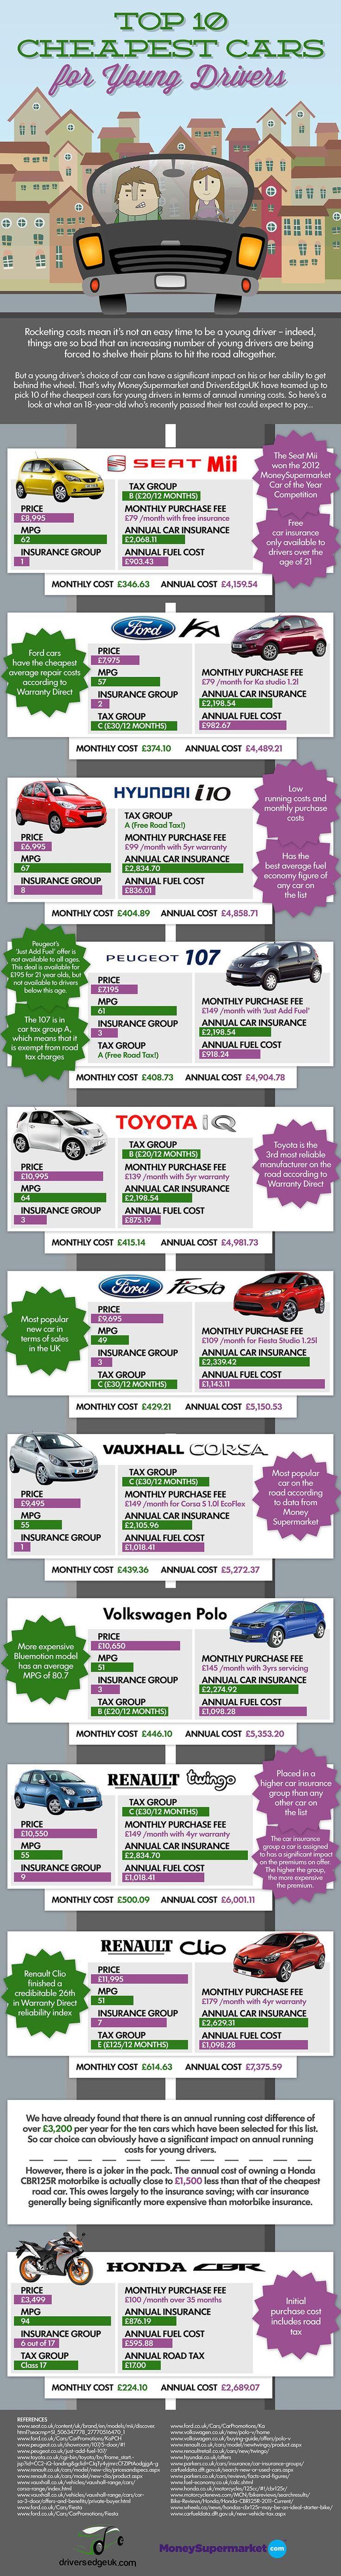 cdl ferrari prices ram com dsc new driving autonews myautoworld all school